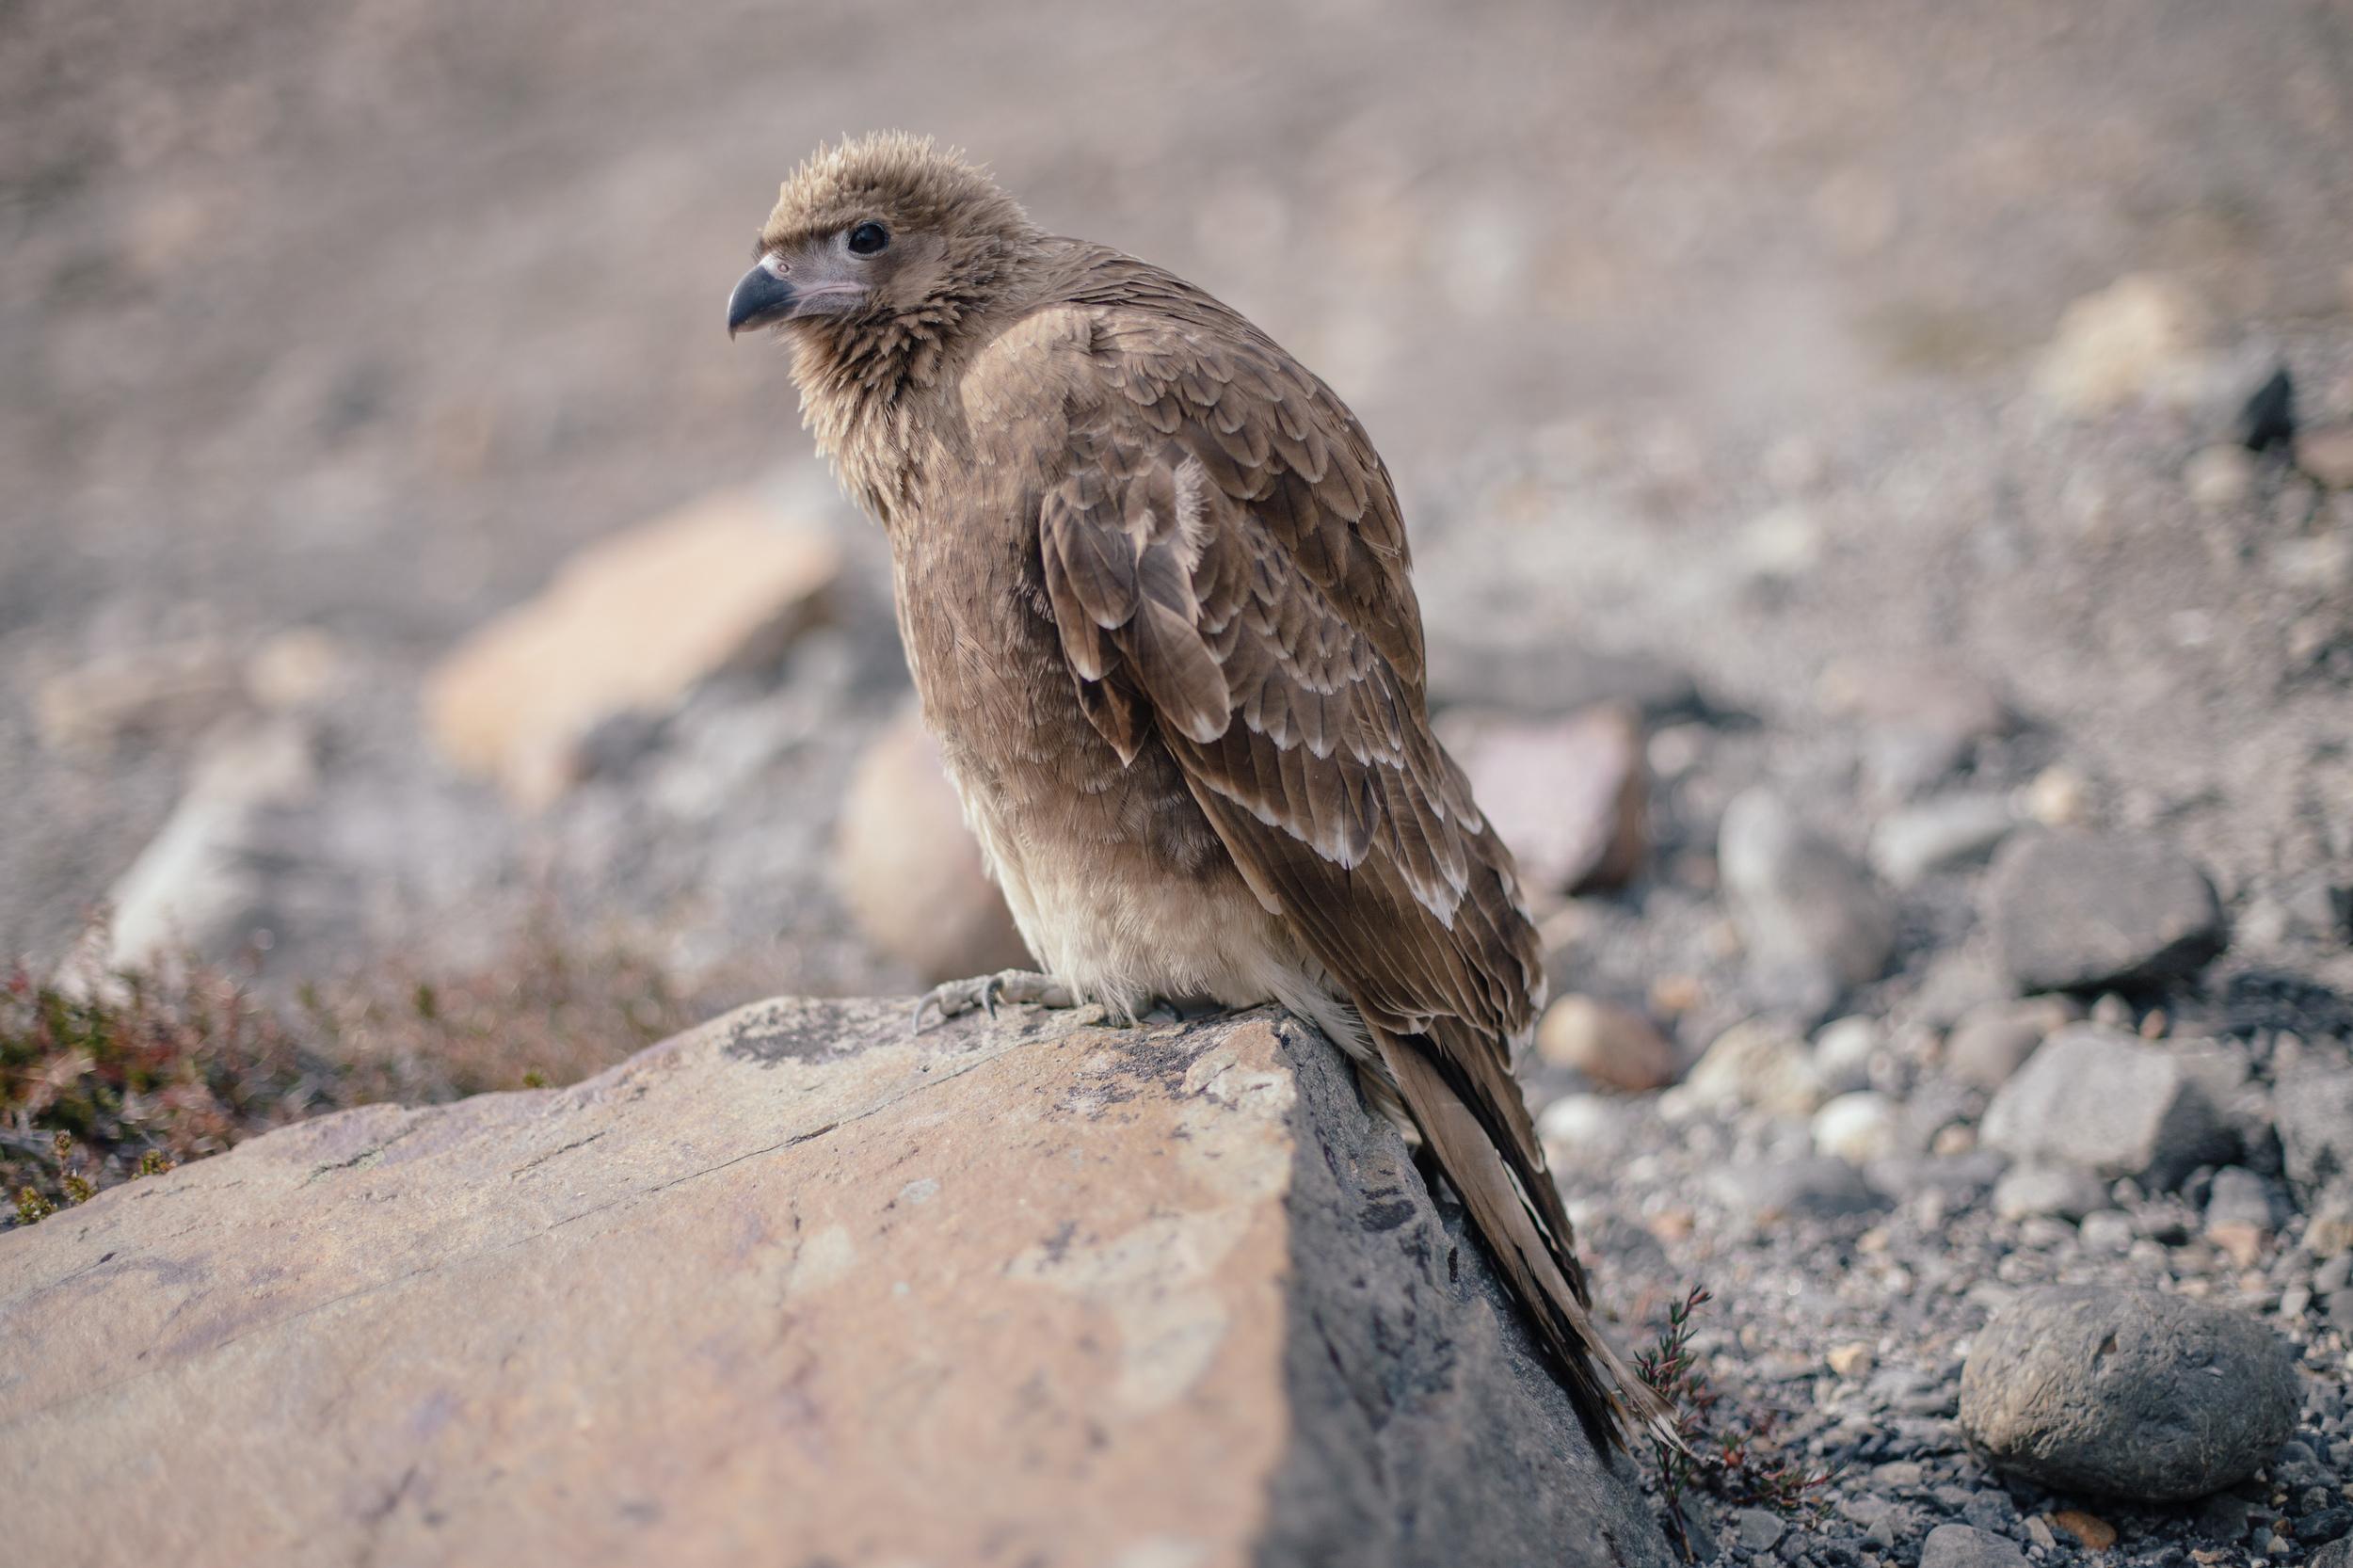 Juvenile Mountain Caracara ((Phalcoboenus megalopterus) ruffling its feathers.